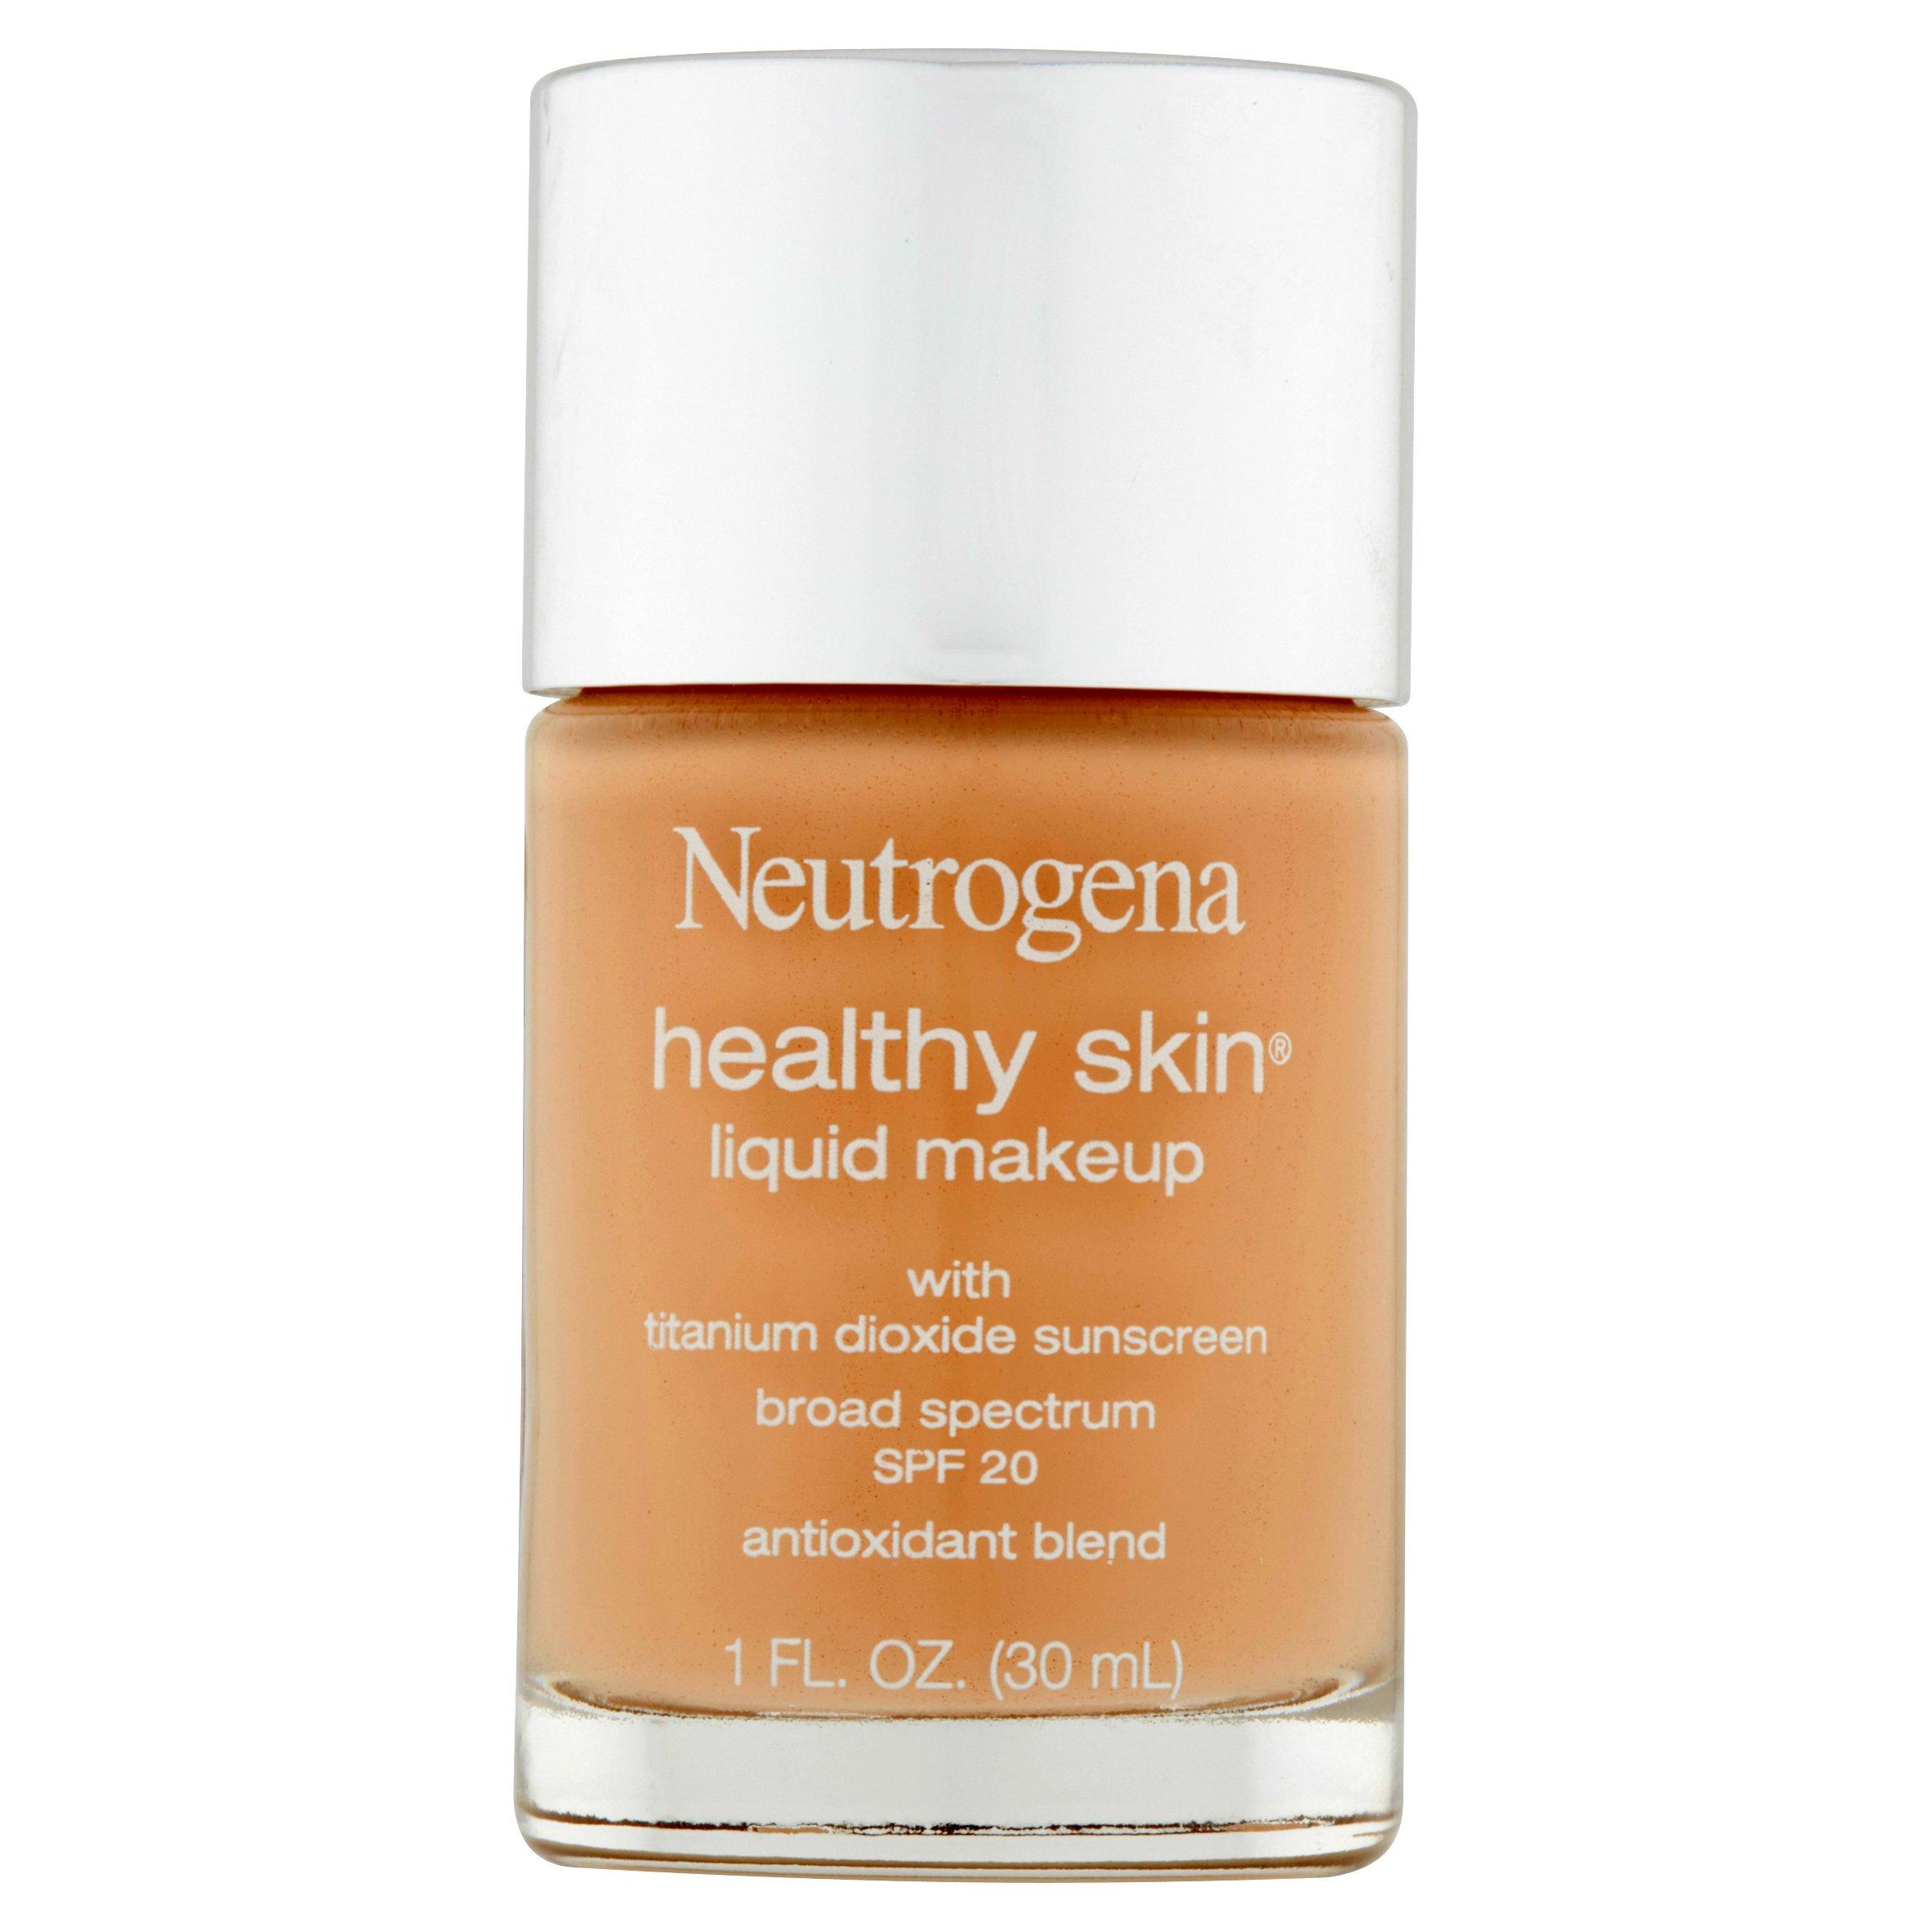 Neutrogena Healthy Skin Liquid Makeup Foundation, Broad Spectrum Spf 20, 10 Classic Ivory, 1 Oz.